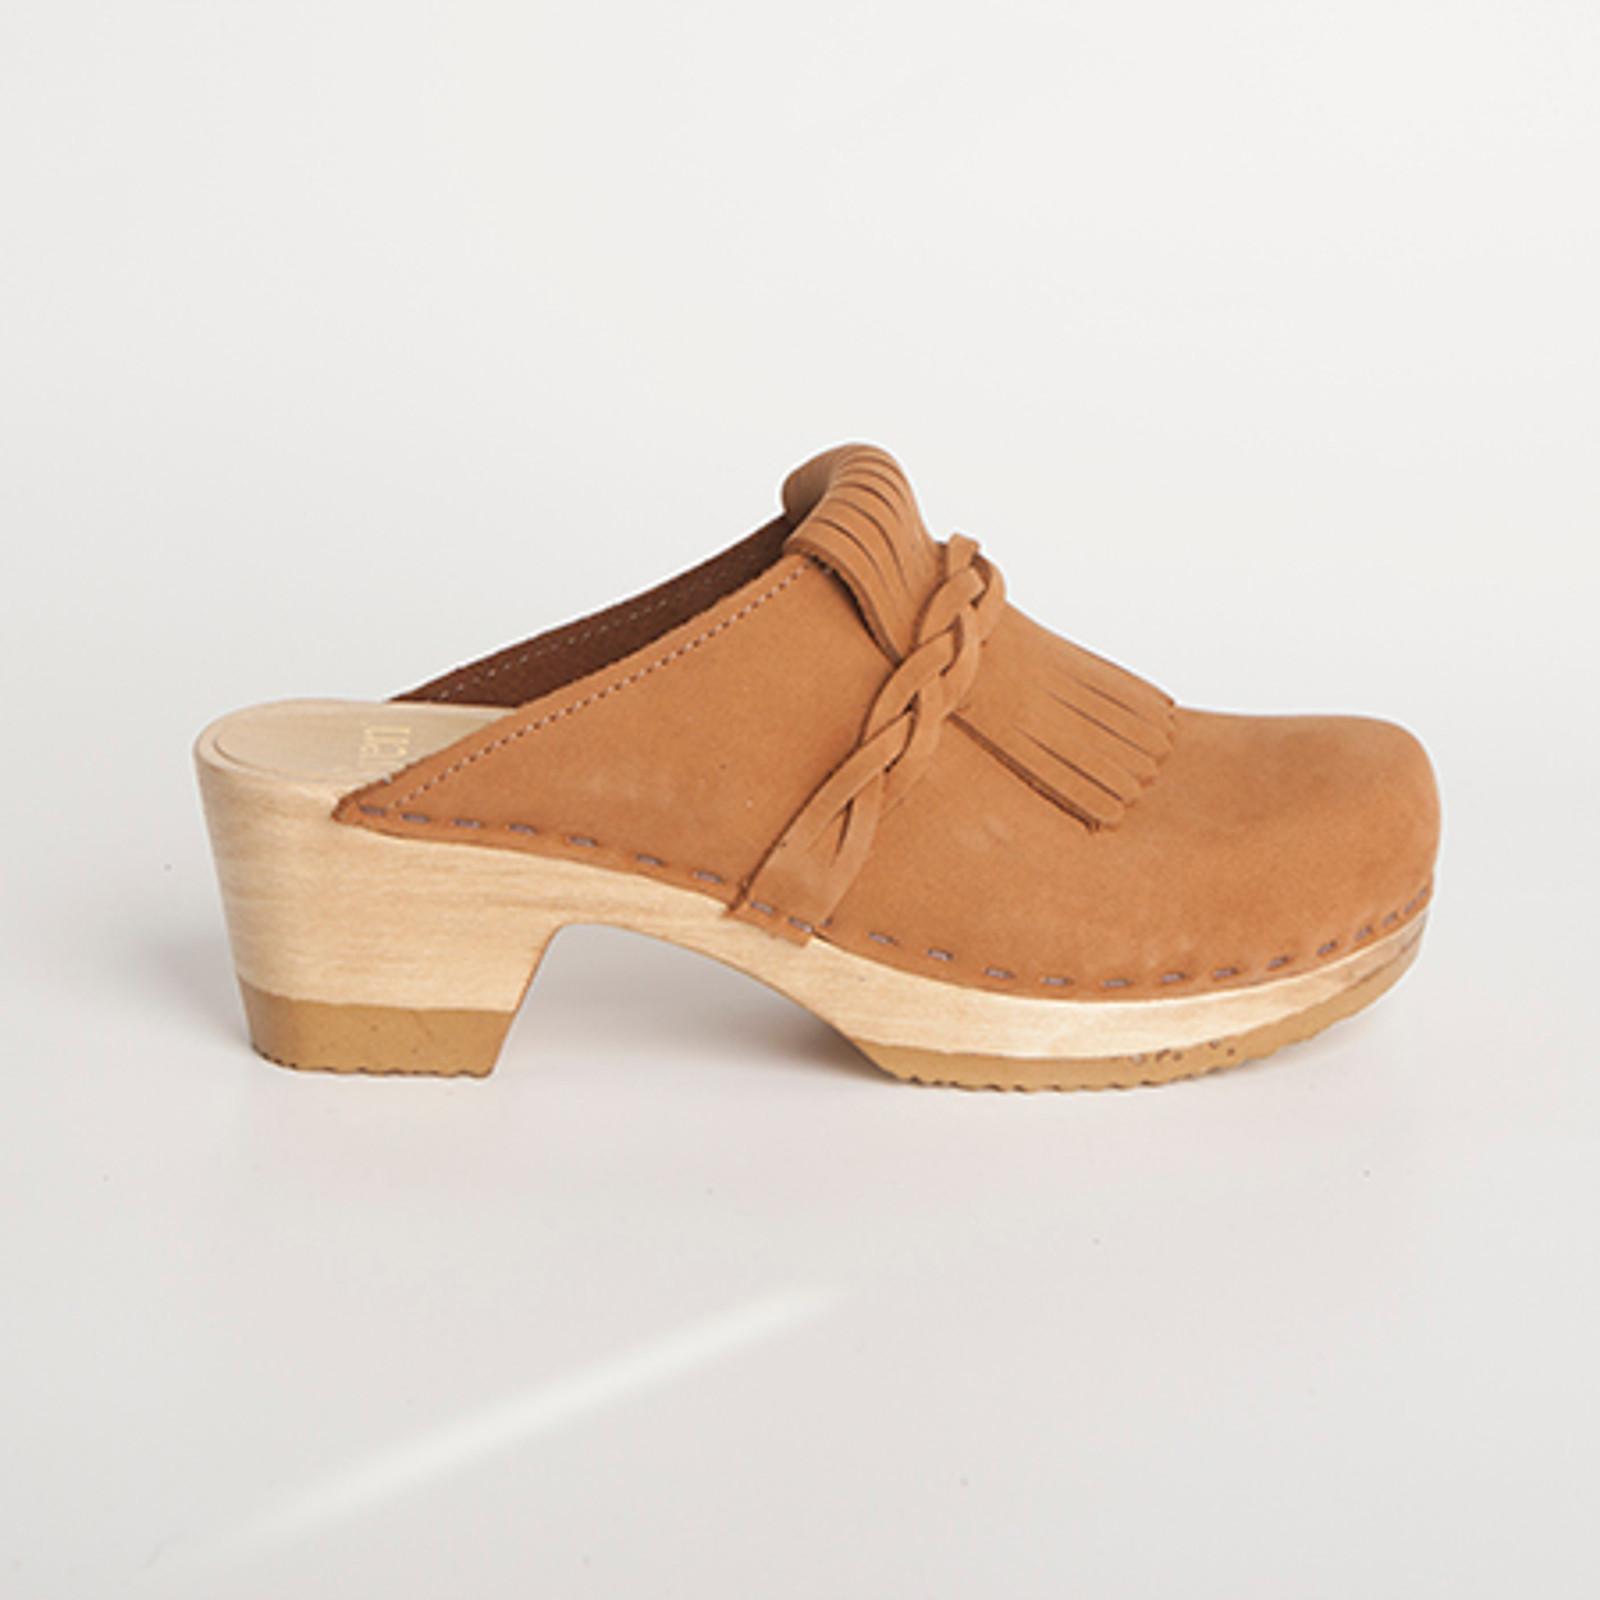 Kiltie Clogs - Mid Heel